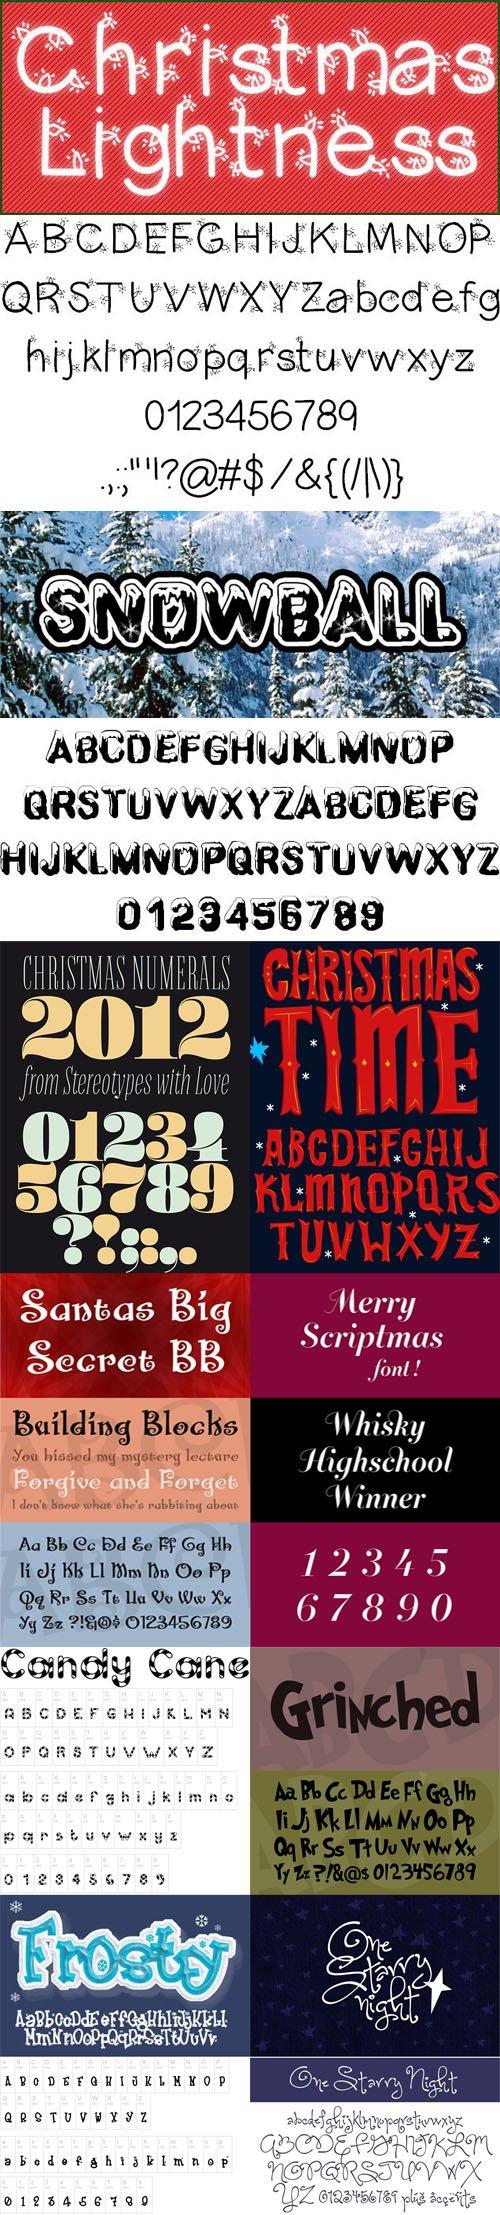 10 Christmas Fonts - 2017 Festive Holiday Fonts